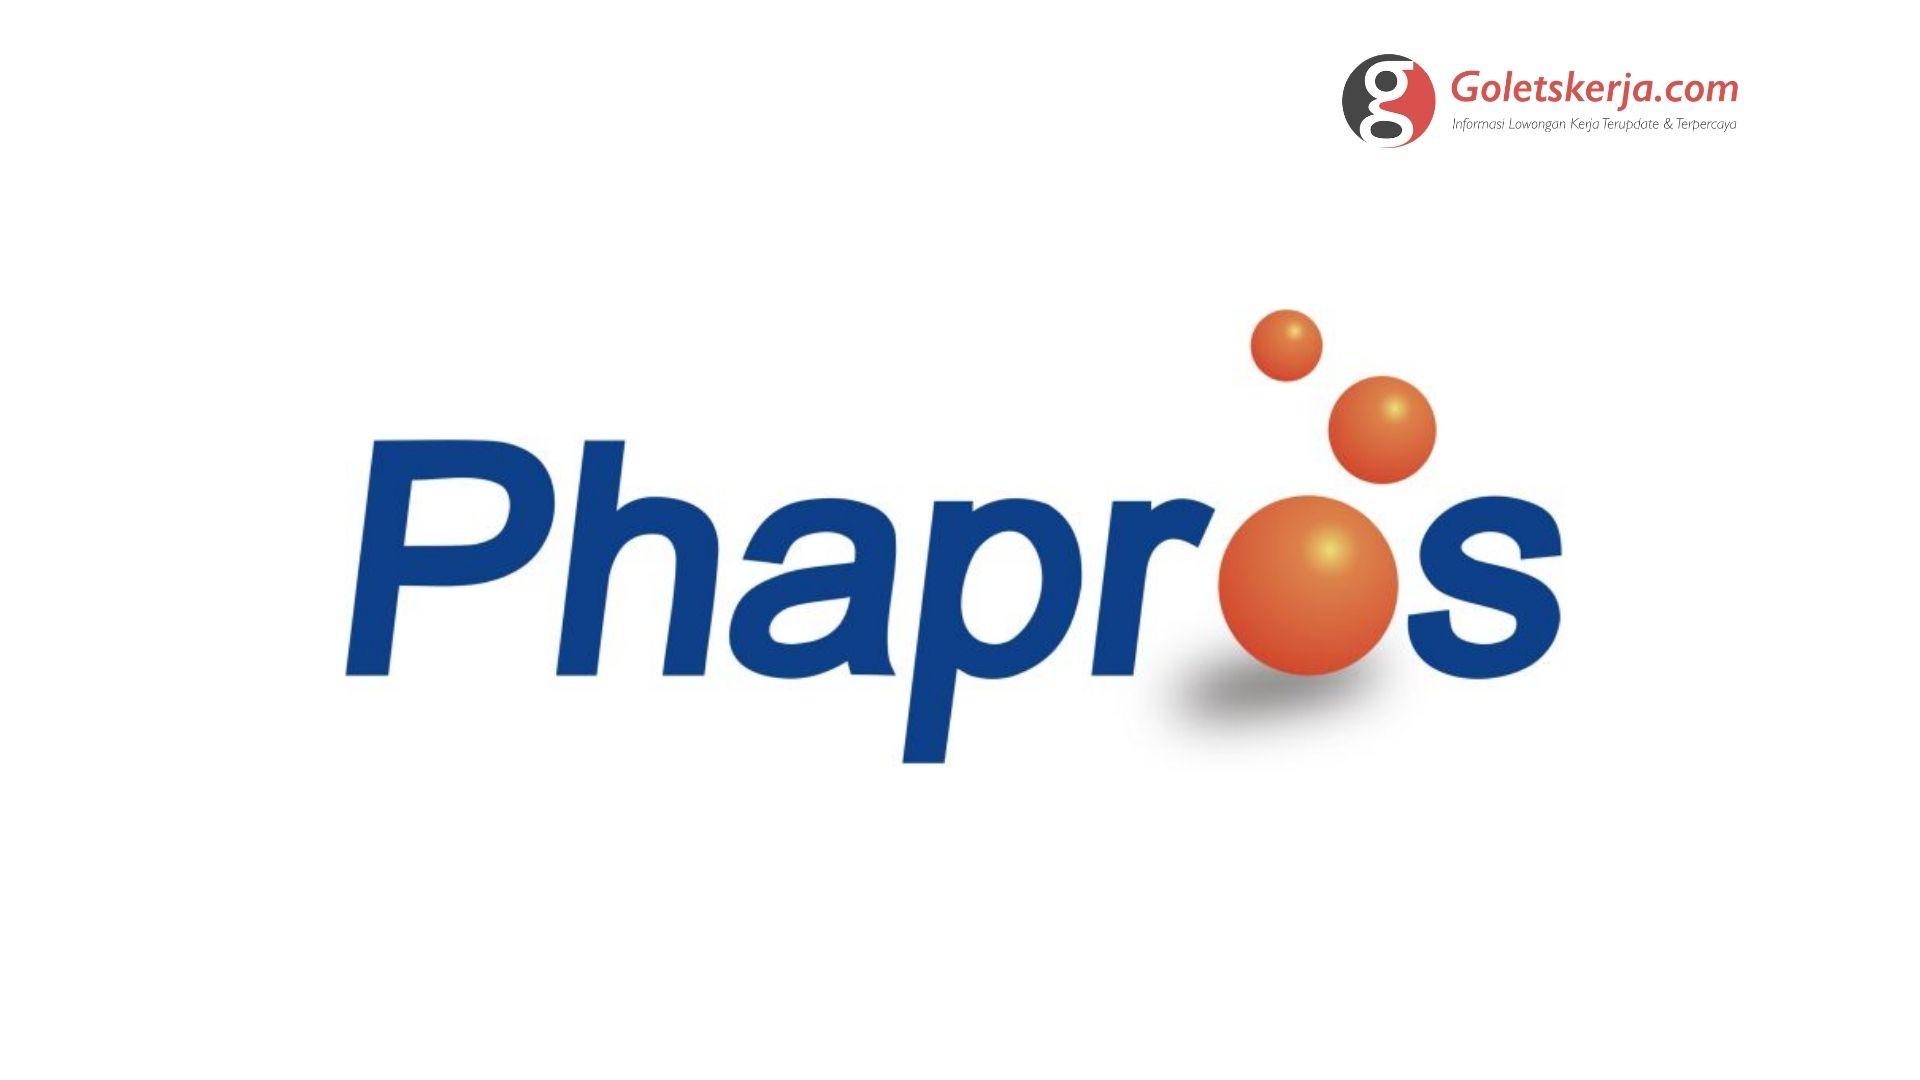 Lowongan Kerja PT Phapros Tbk. - Terbaru 2021